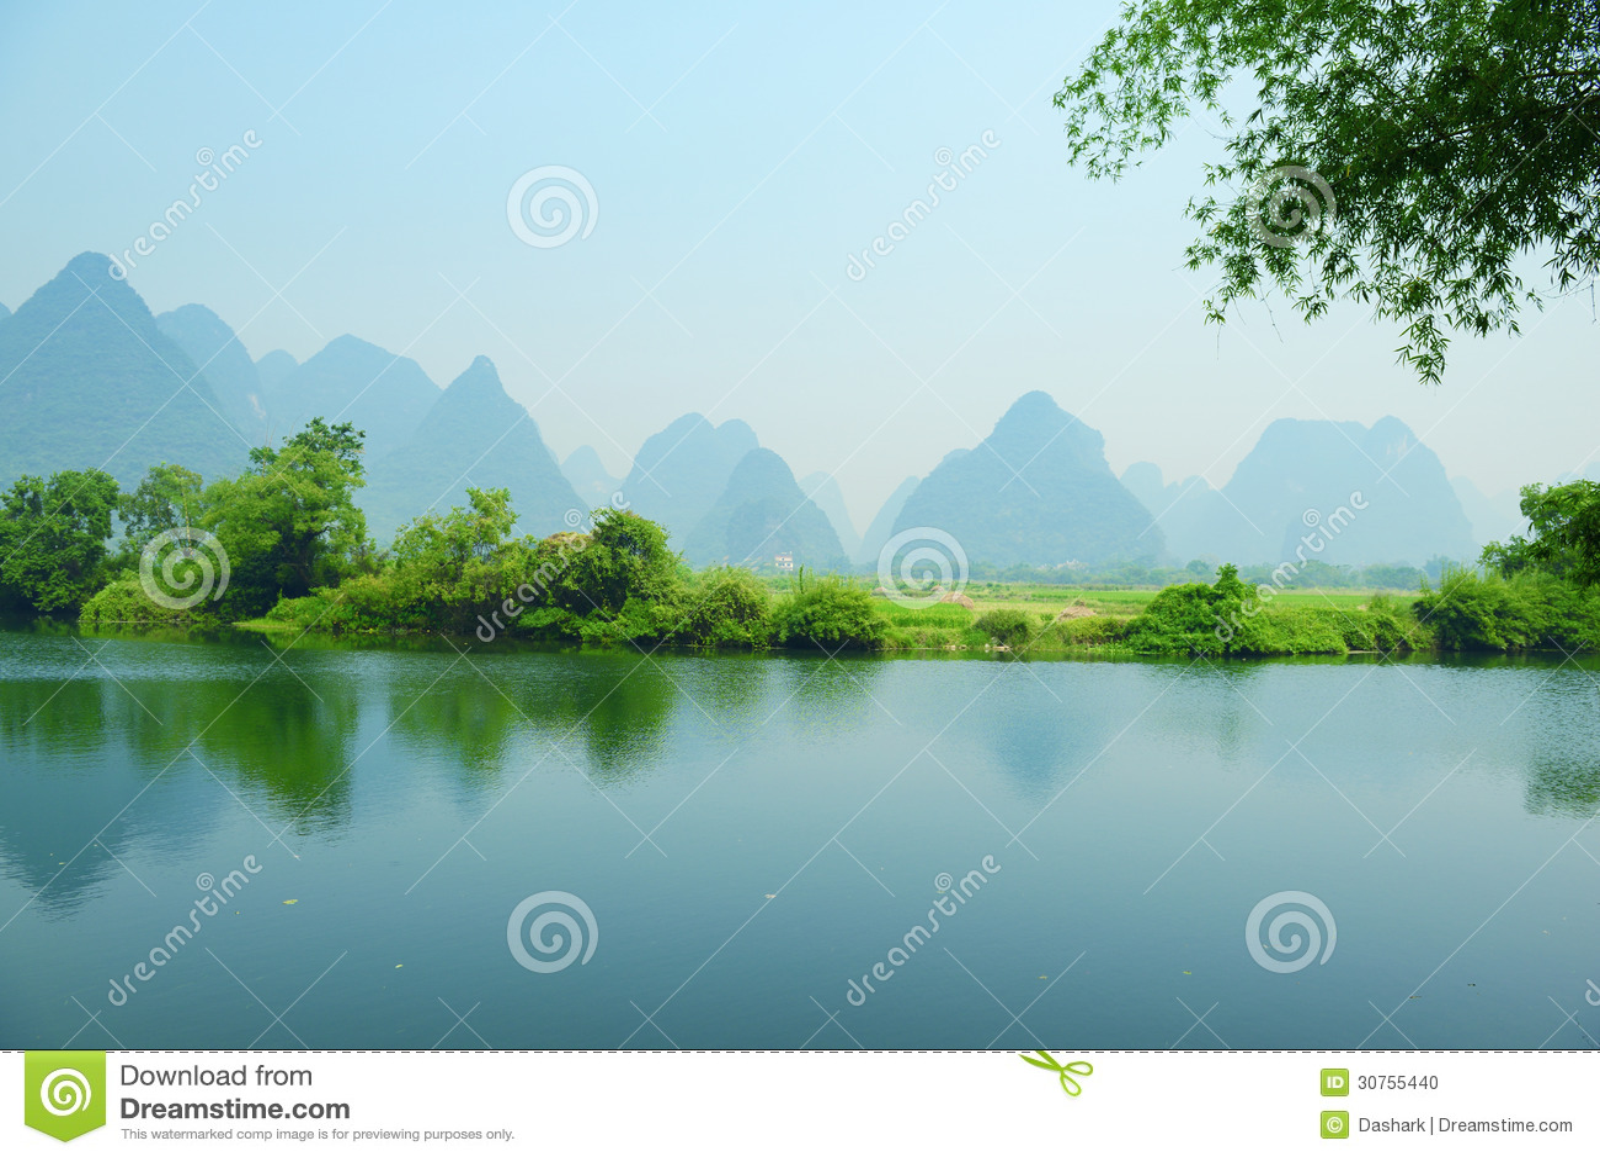 Karst Mountain Landscape In Yangshuo Guilin, Stock Photo - Image ...